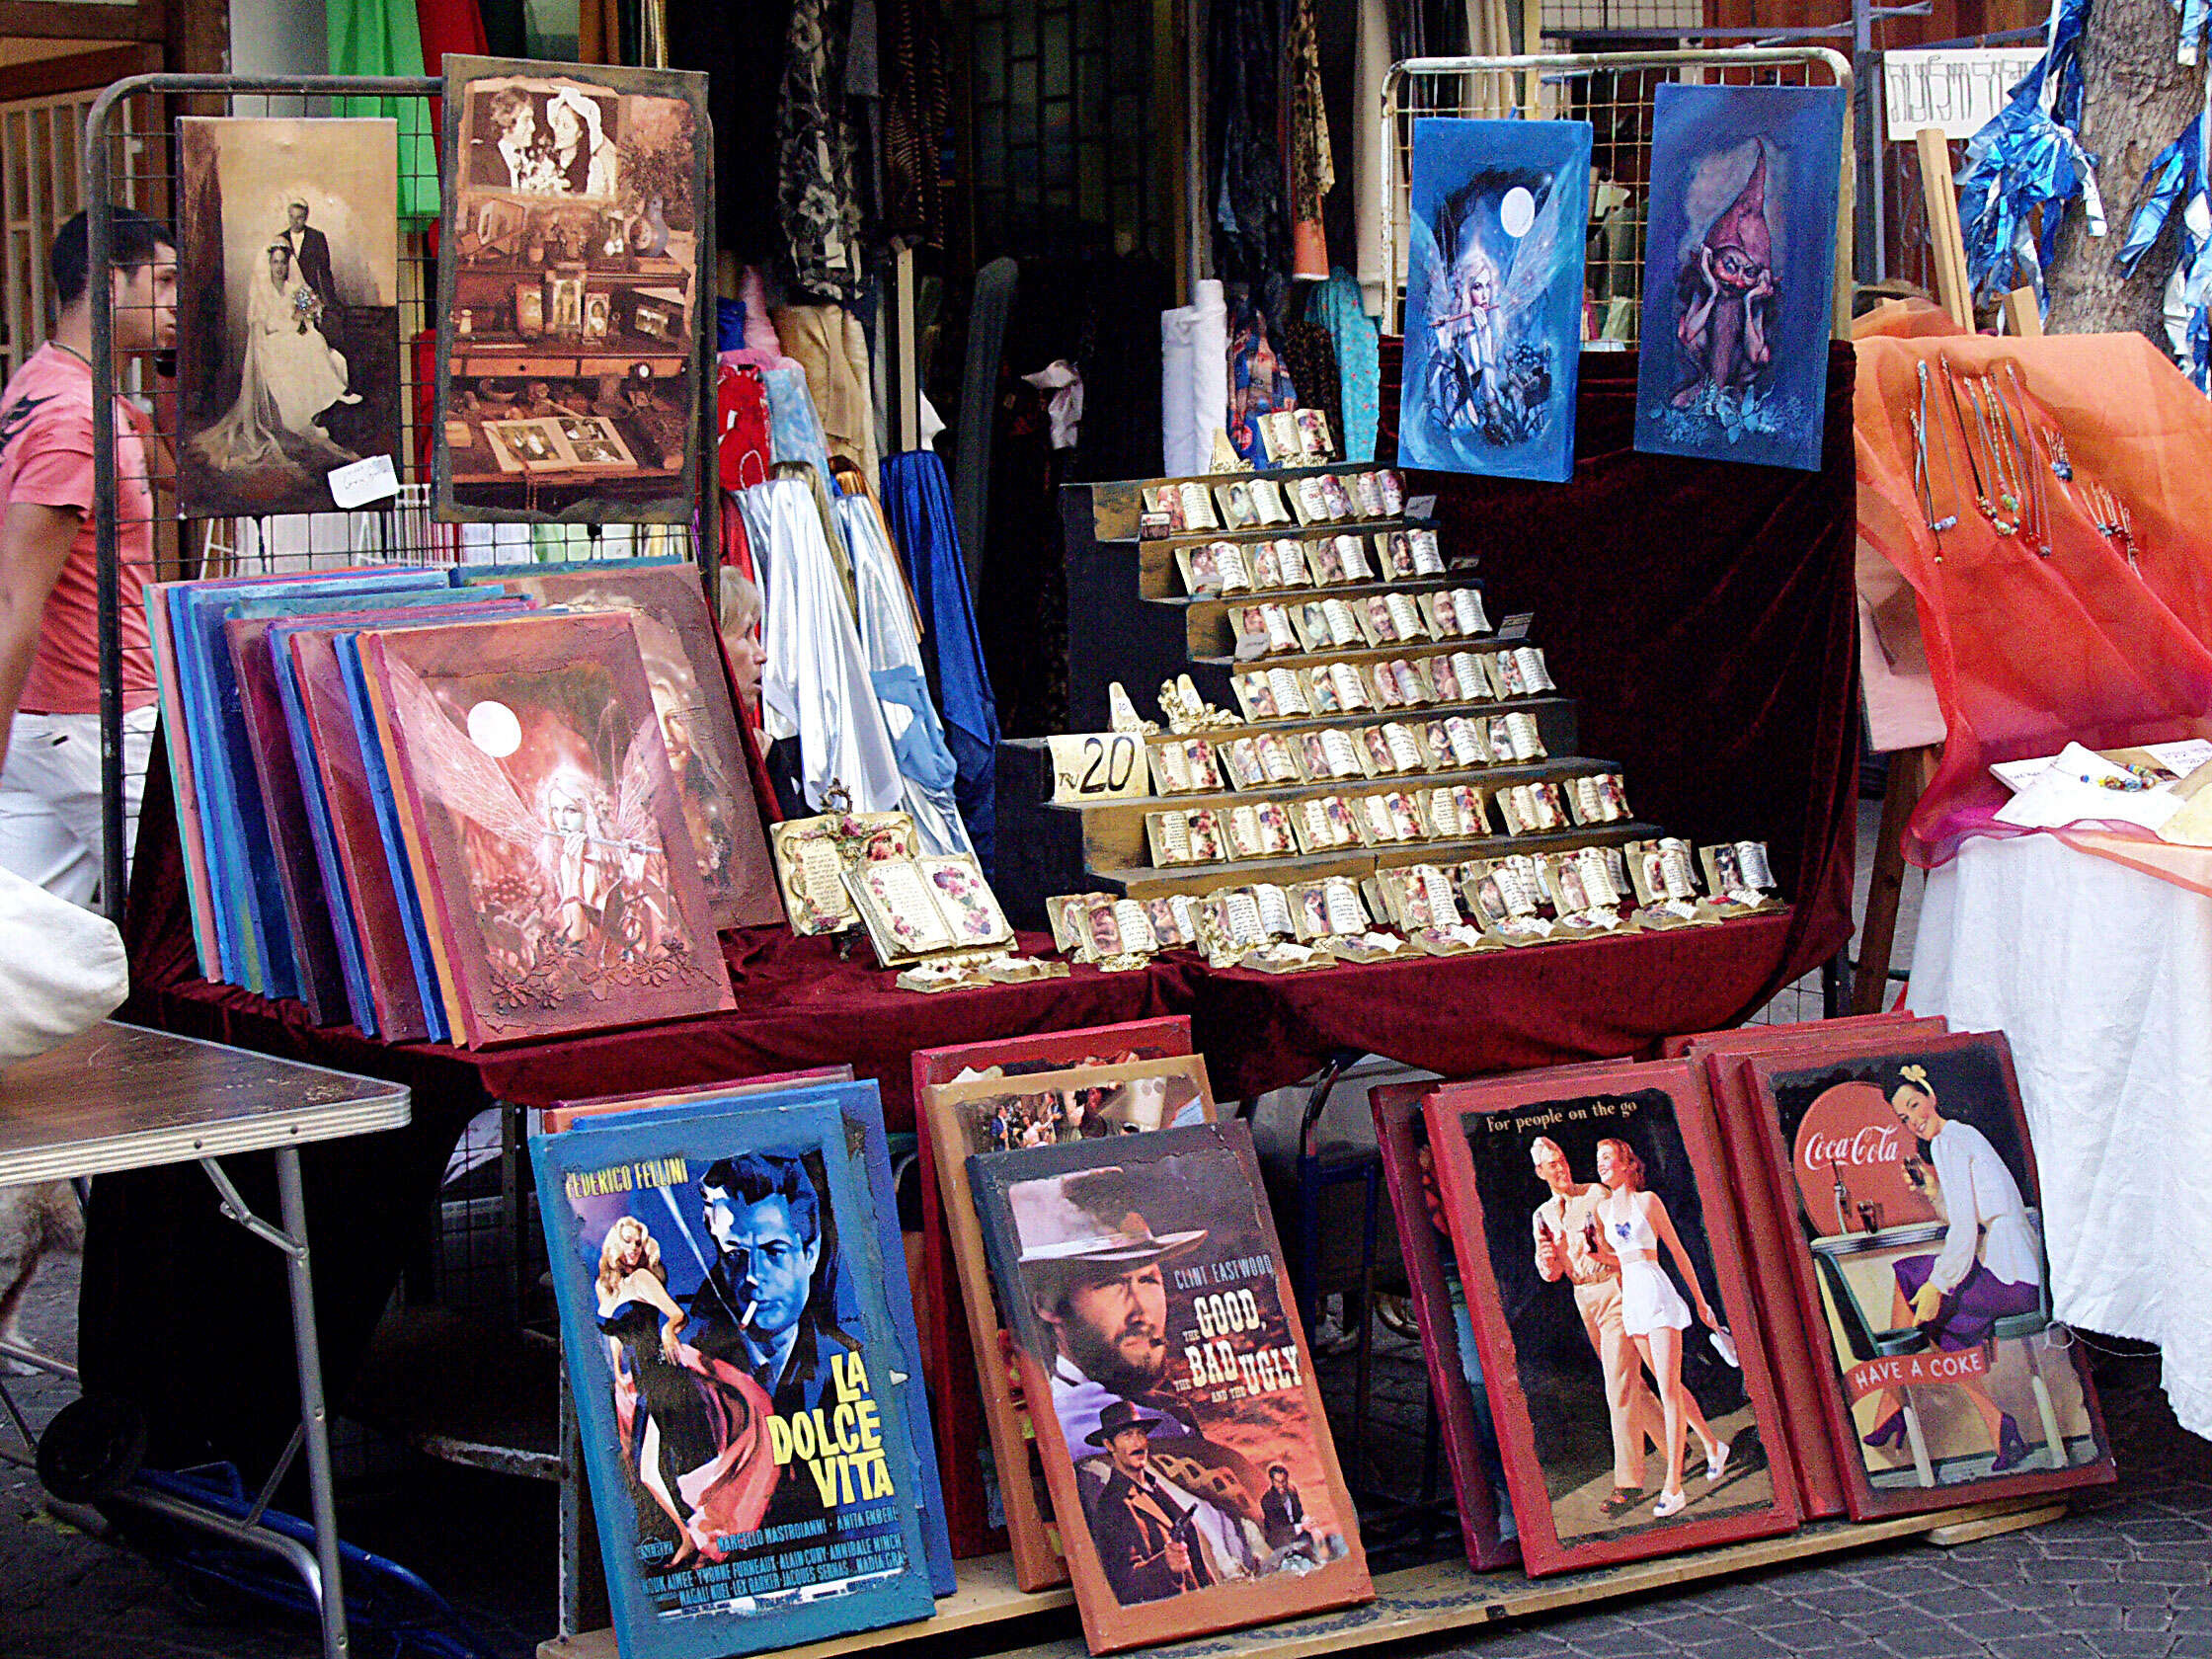 A great local shopping areat, Nahalat Binyamin Market